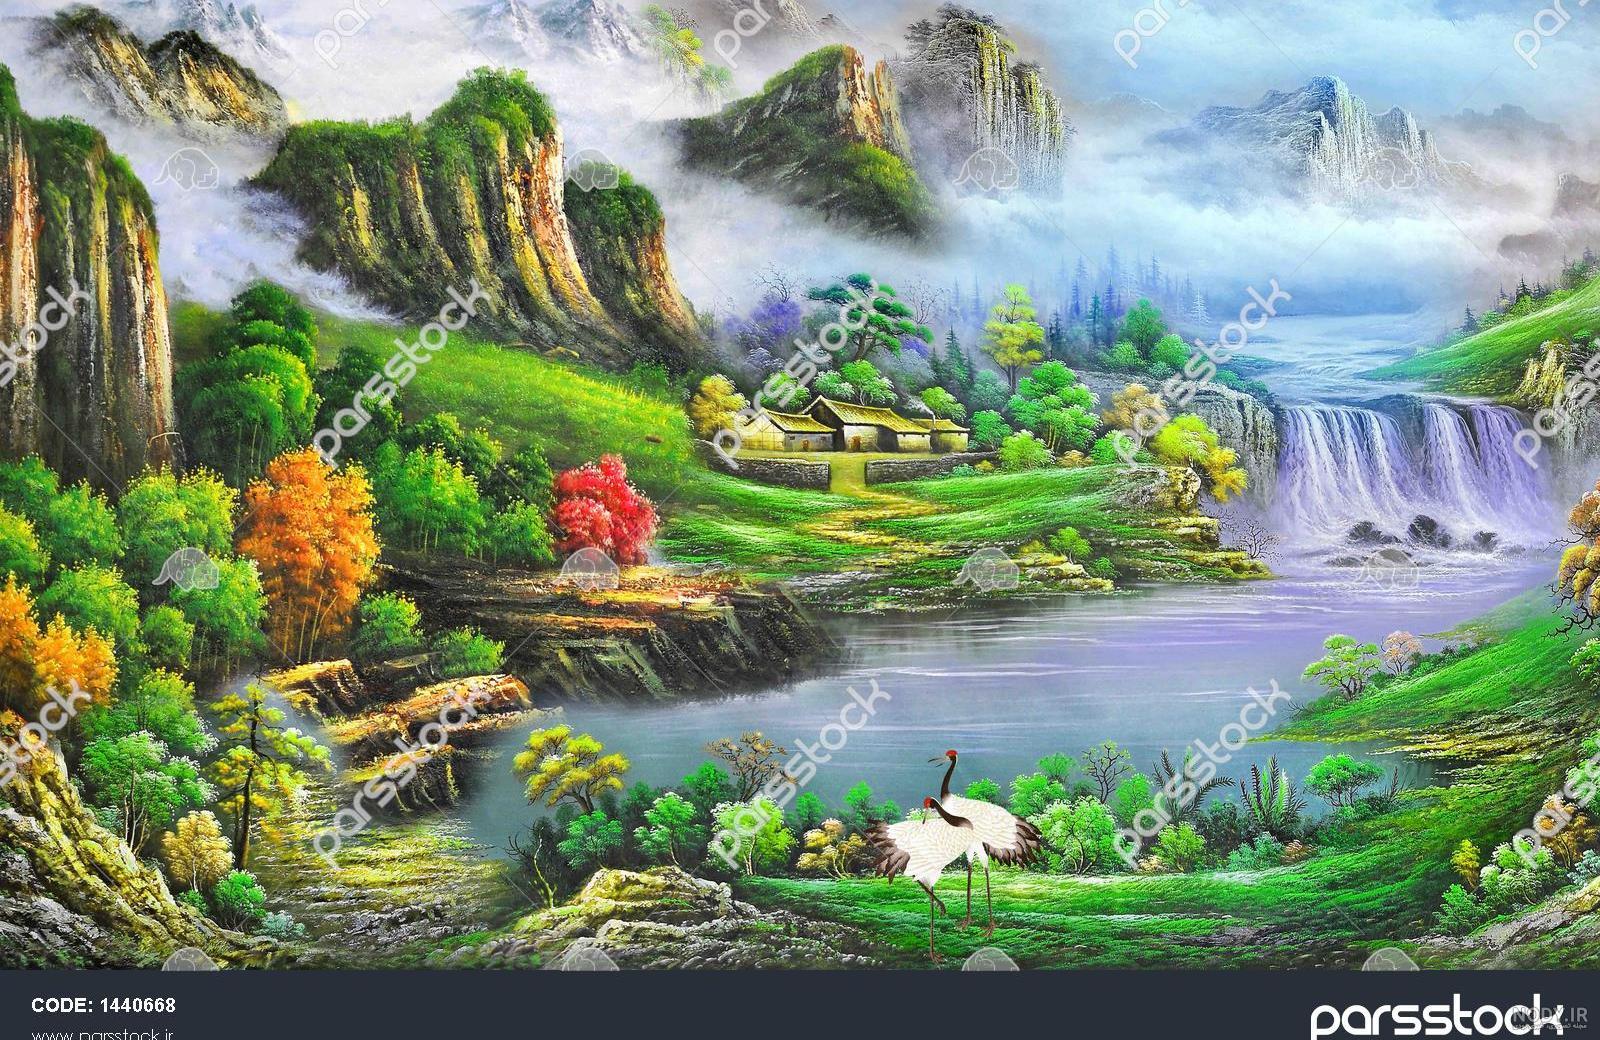 عکس سه بعدی طبیعت